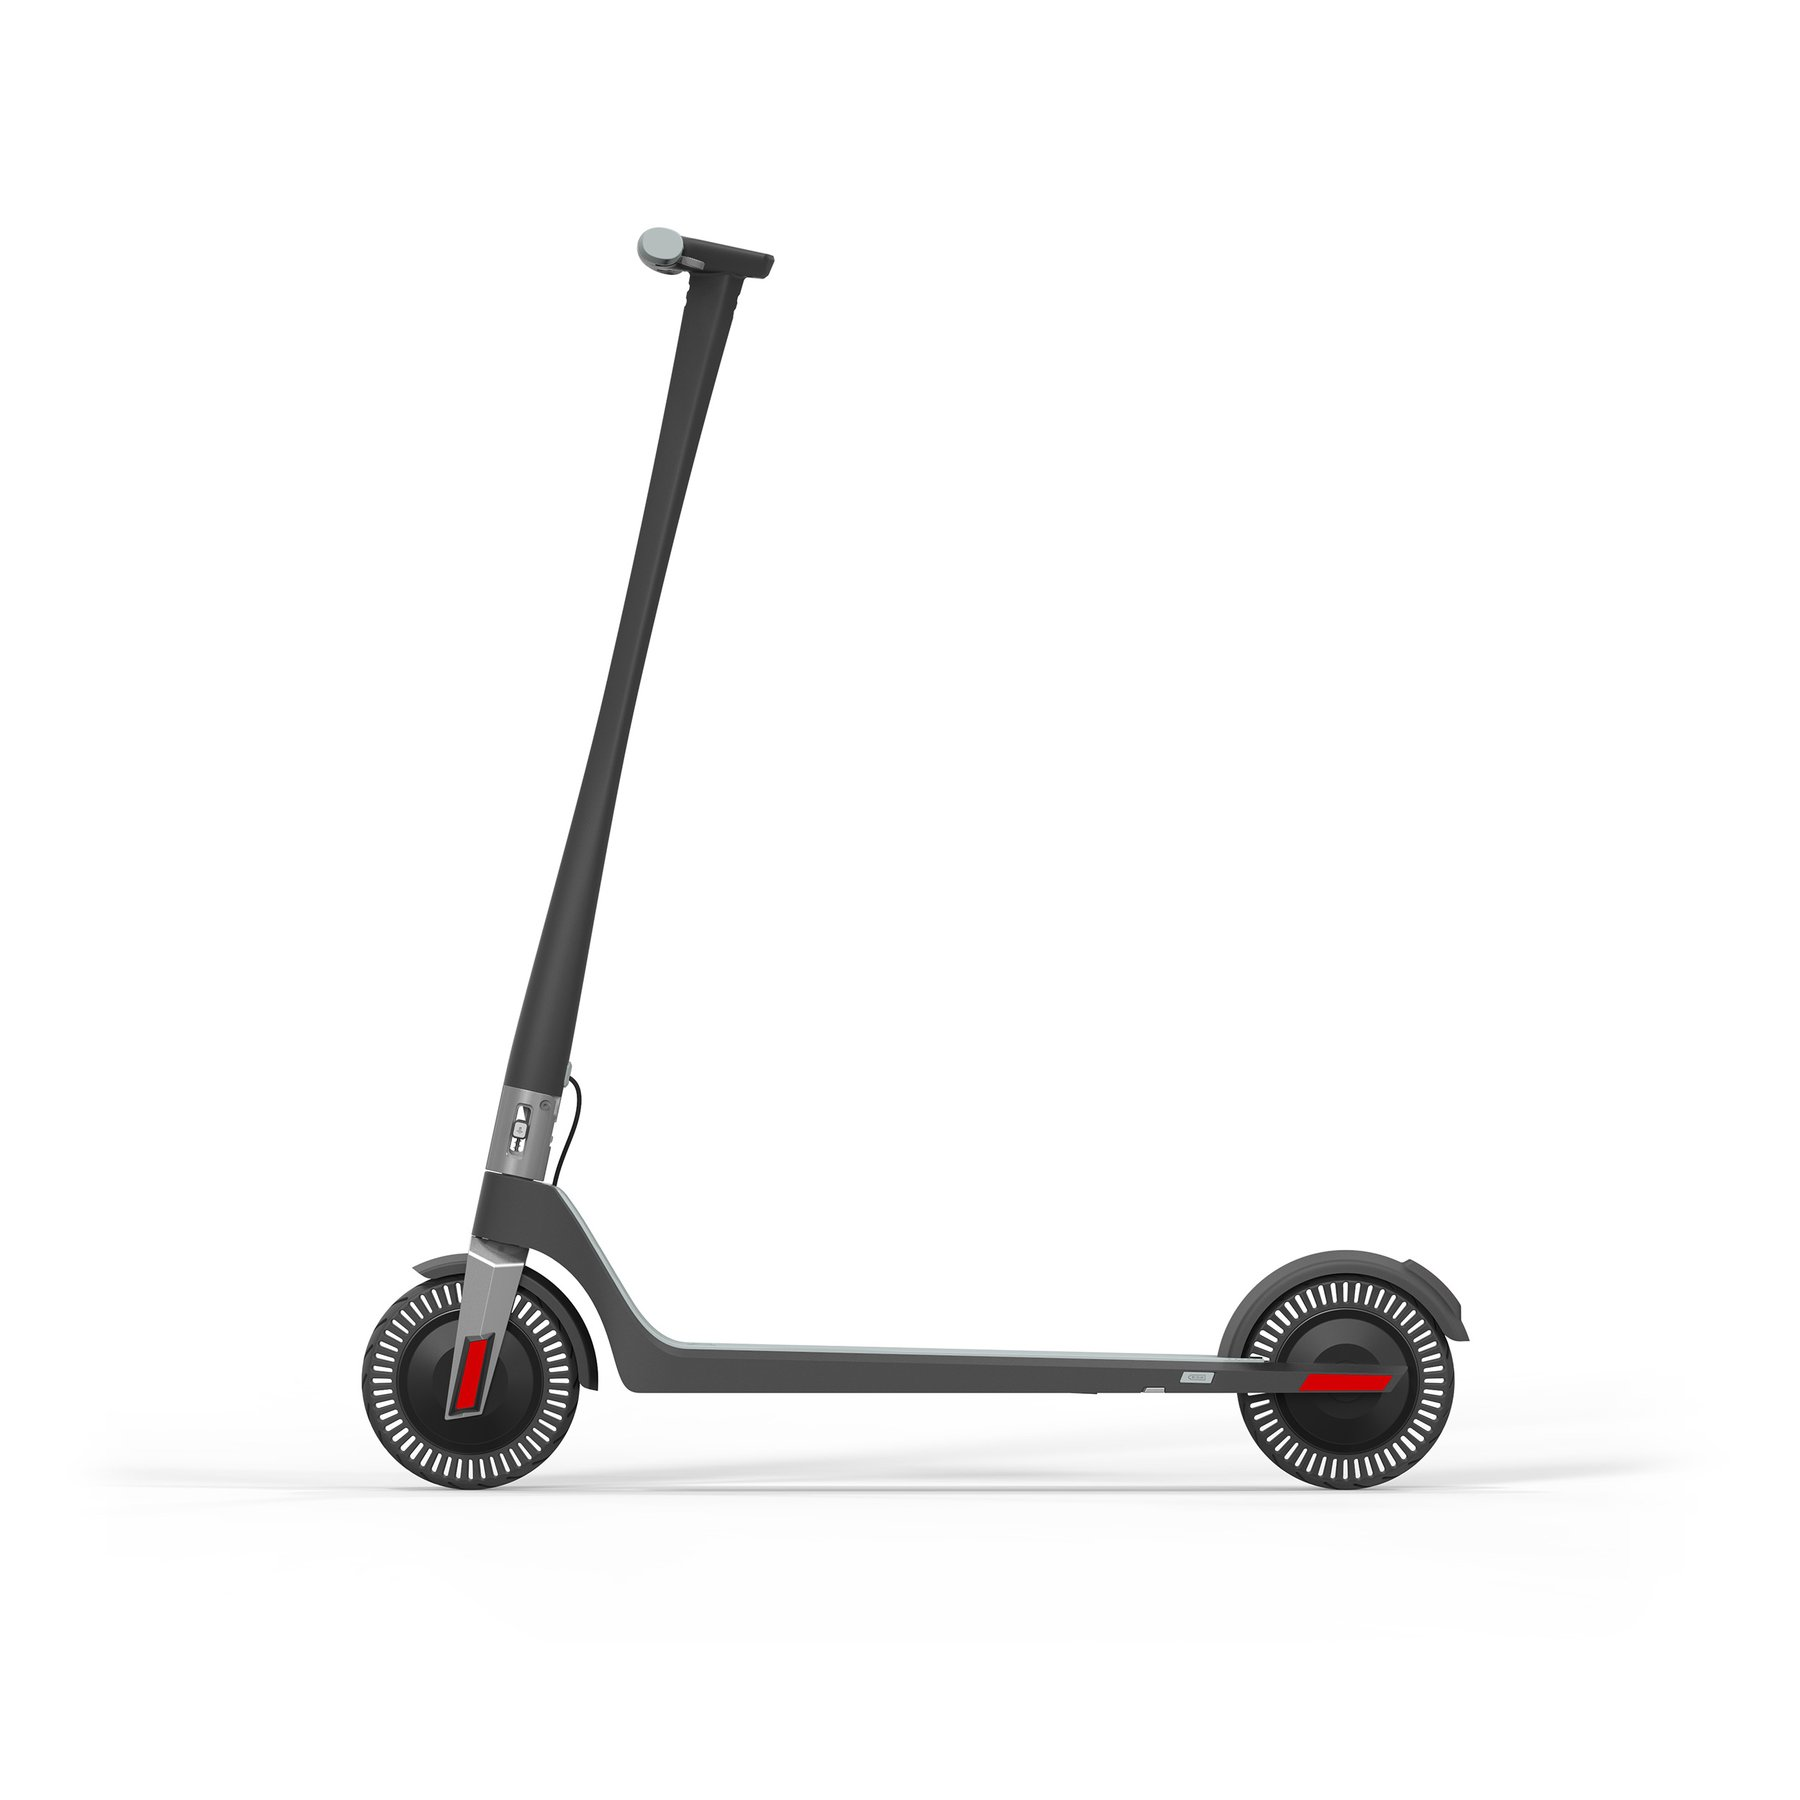 scooter_matte_black_01_1800x1800.jpg